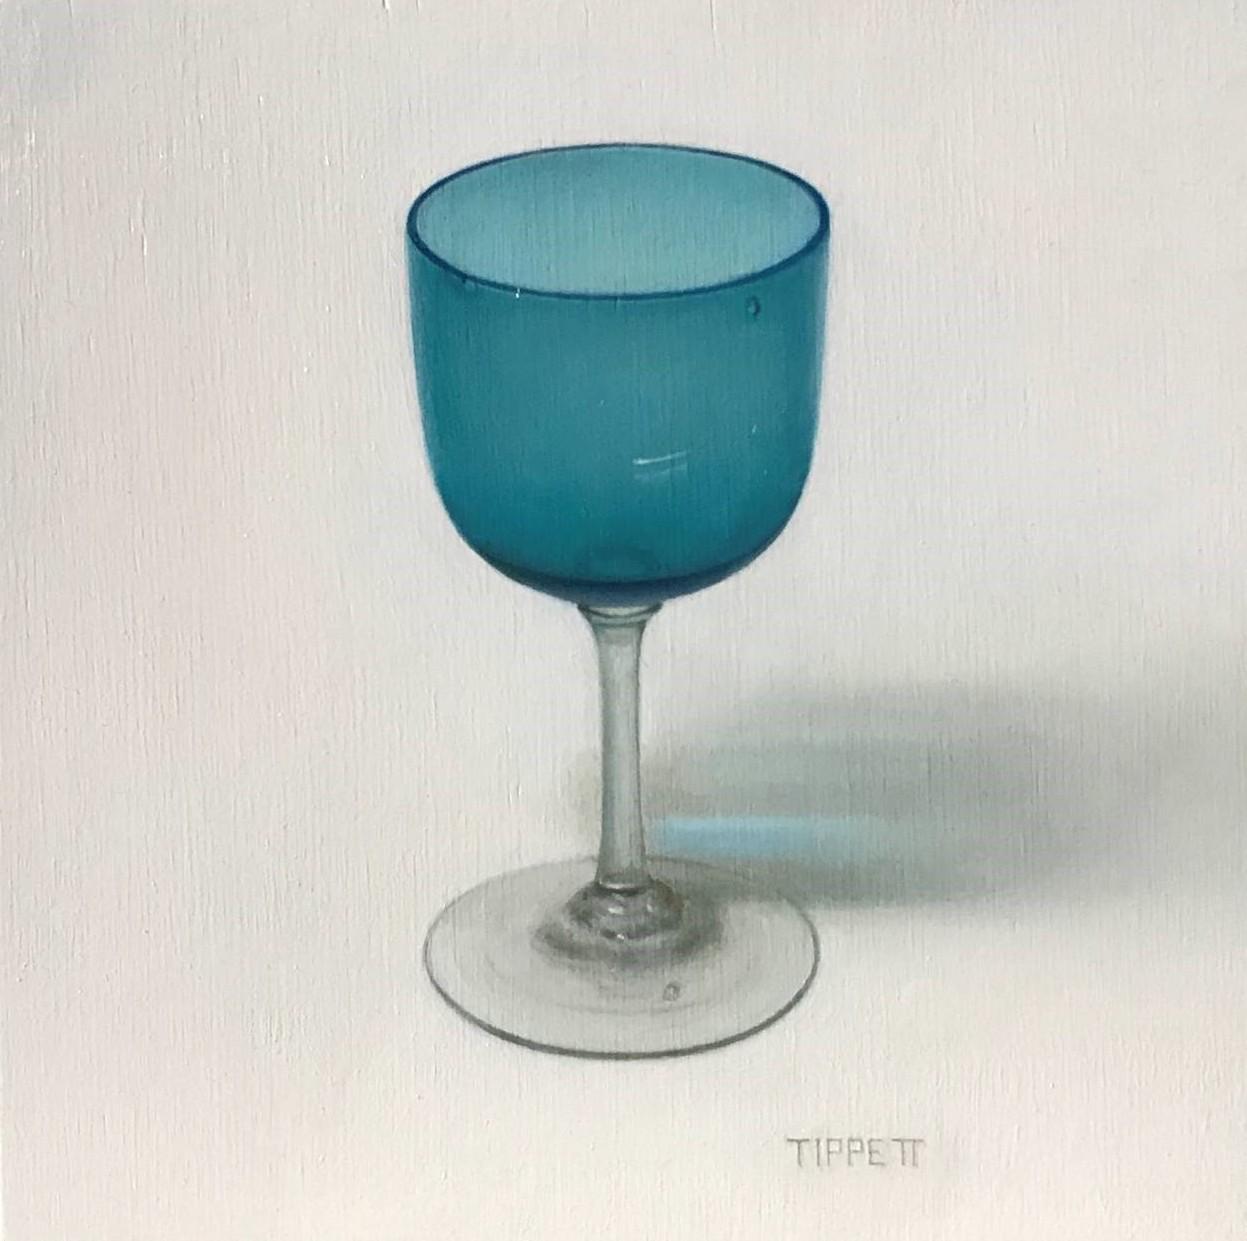 Margarets-blue-wine-glass-15x15-cm-2750-e1572836315757